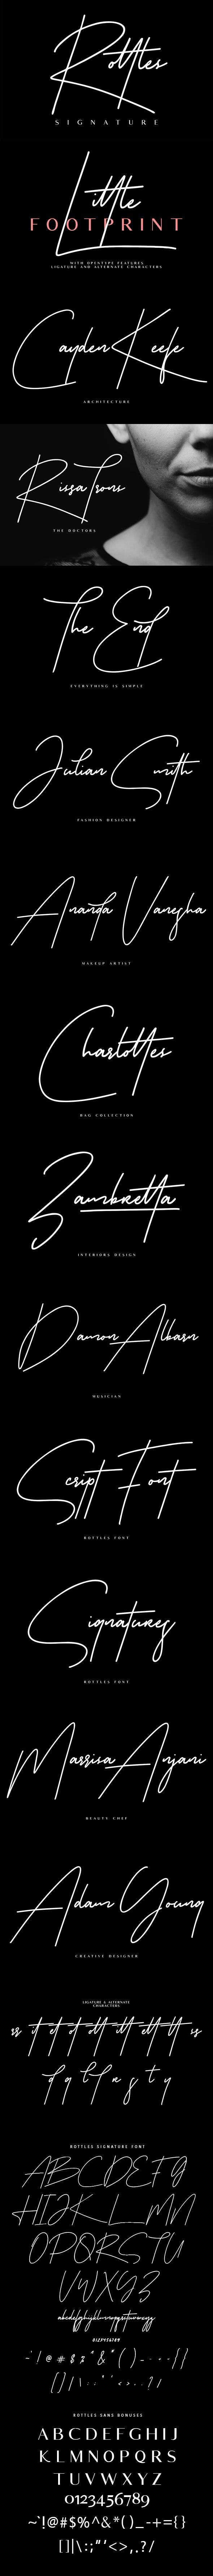 Rottles Signature Font - Calligraphy Script